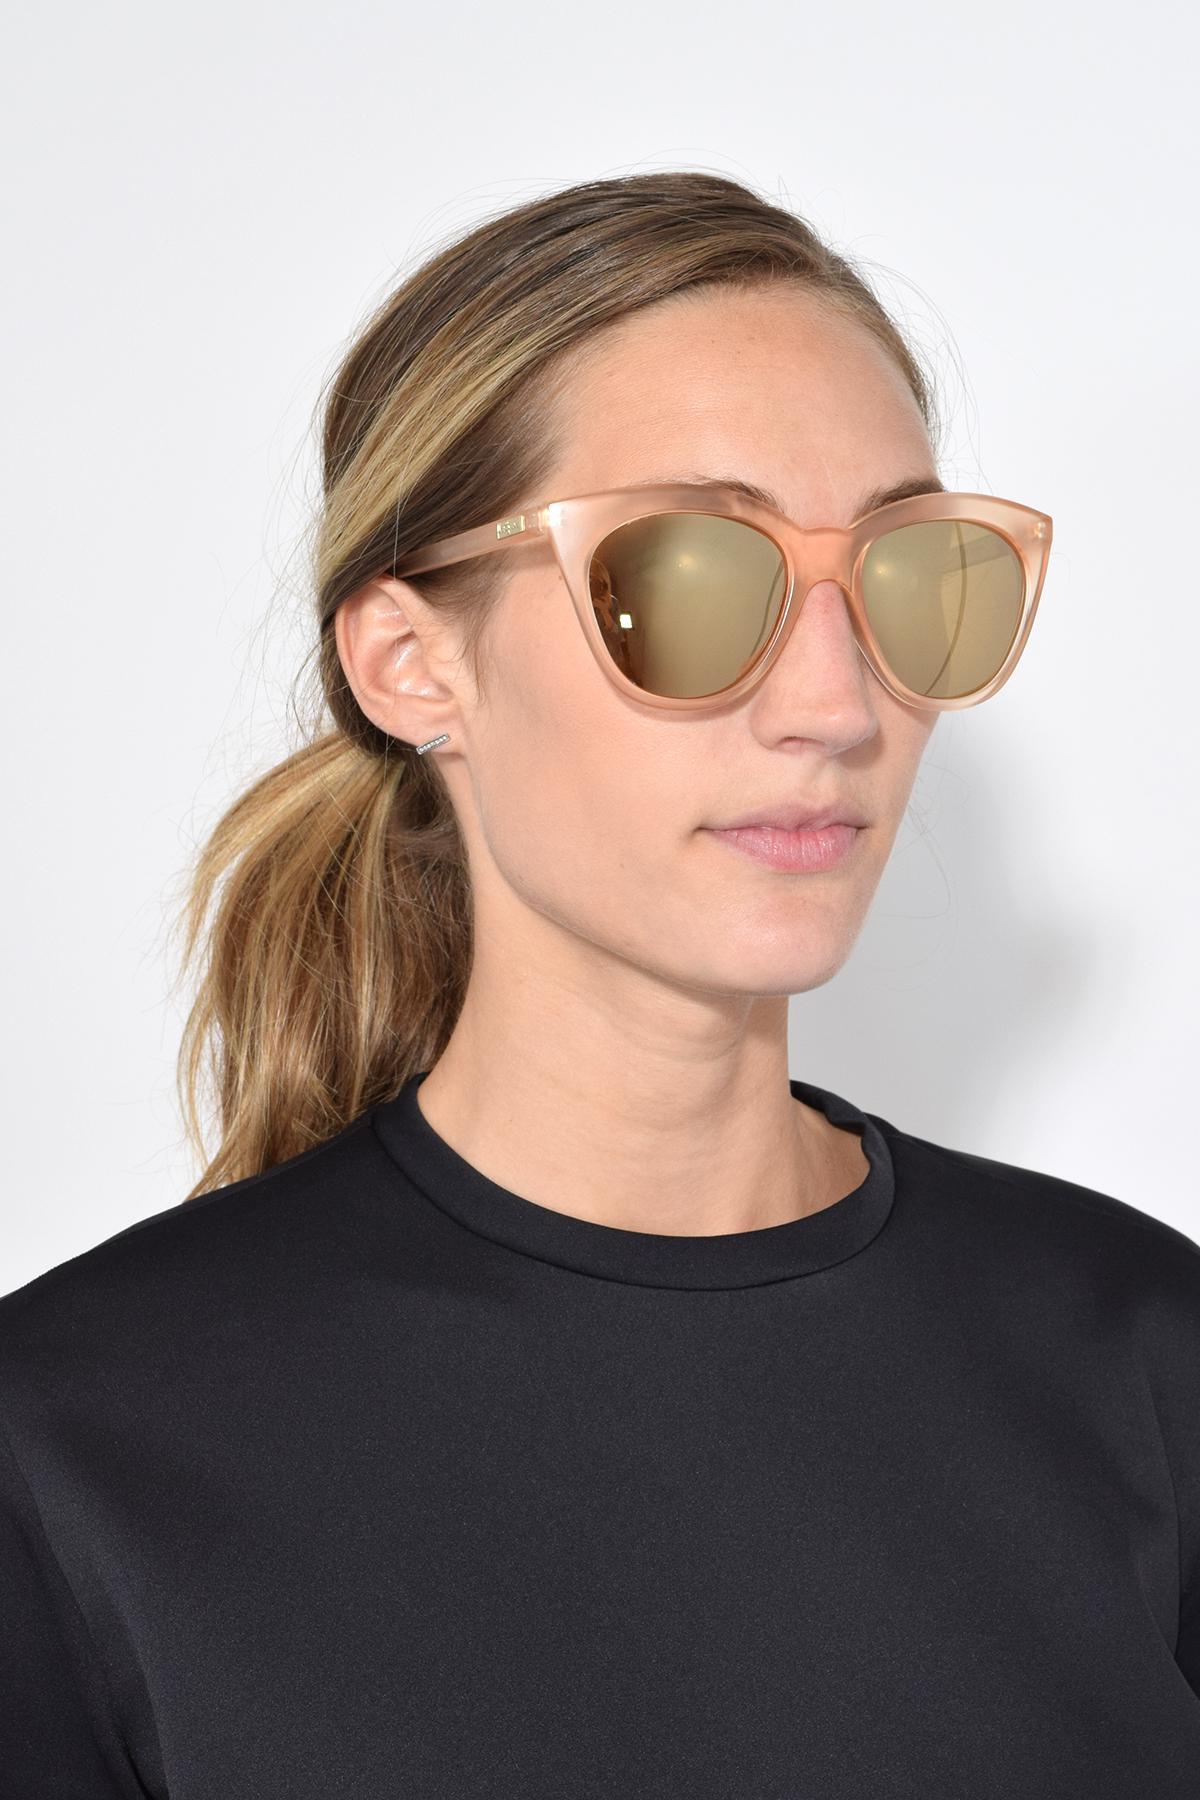 87d3f0c4c8 Lyst - Le Specs Halfmoon Magic Sunglasses In Raw Sugar